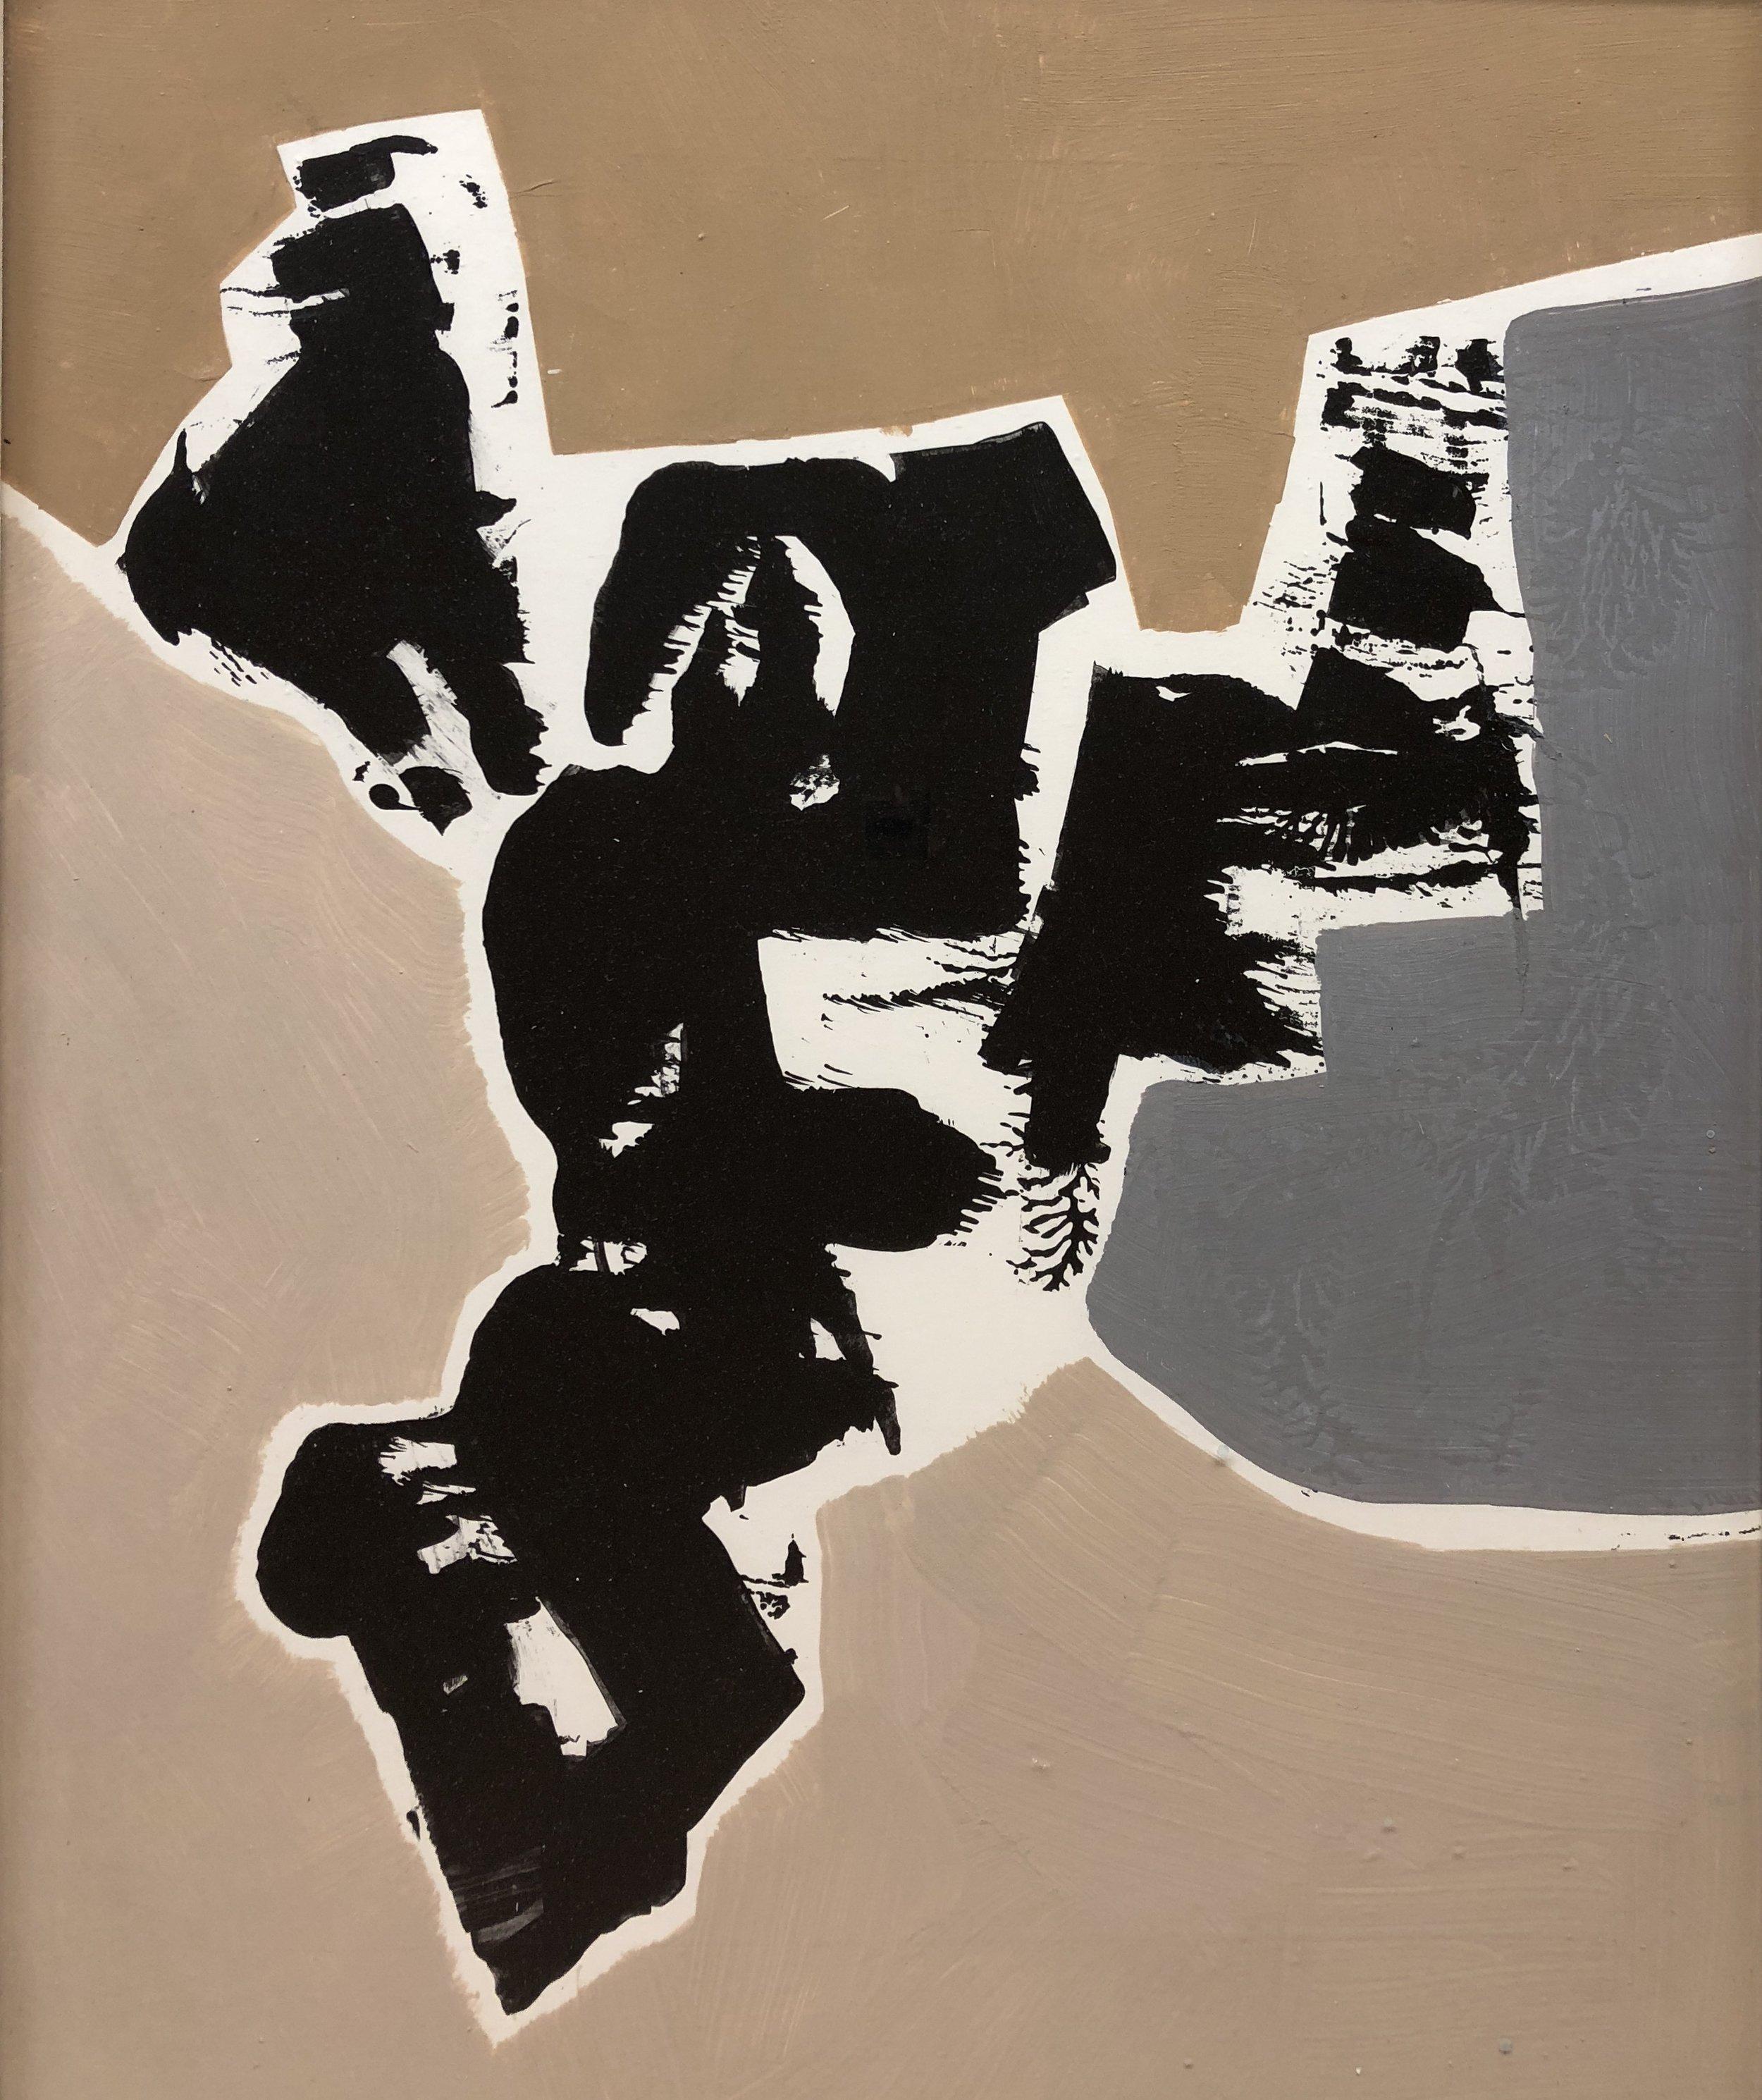 Hermit Thrush_15.5x19.5_mixed media on paper_1750.JPG